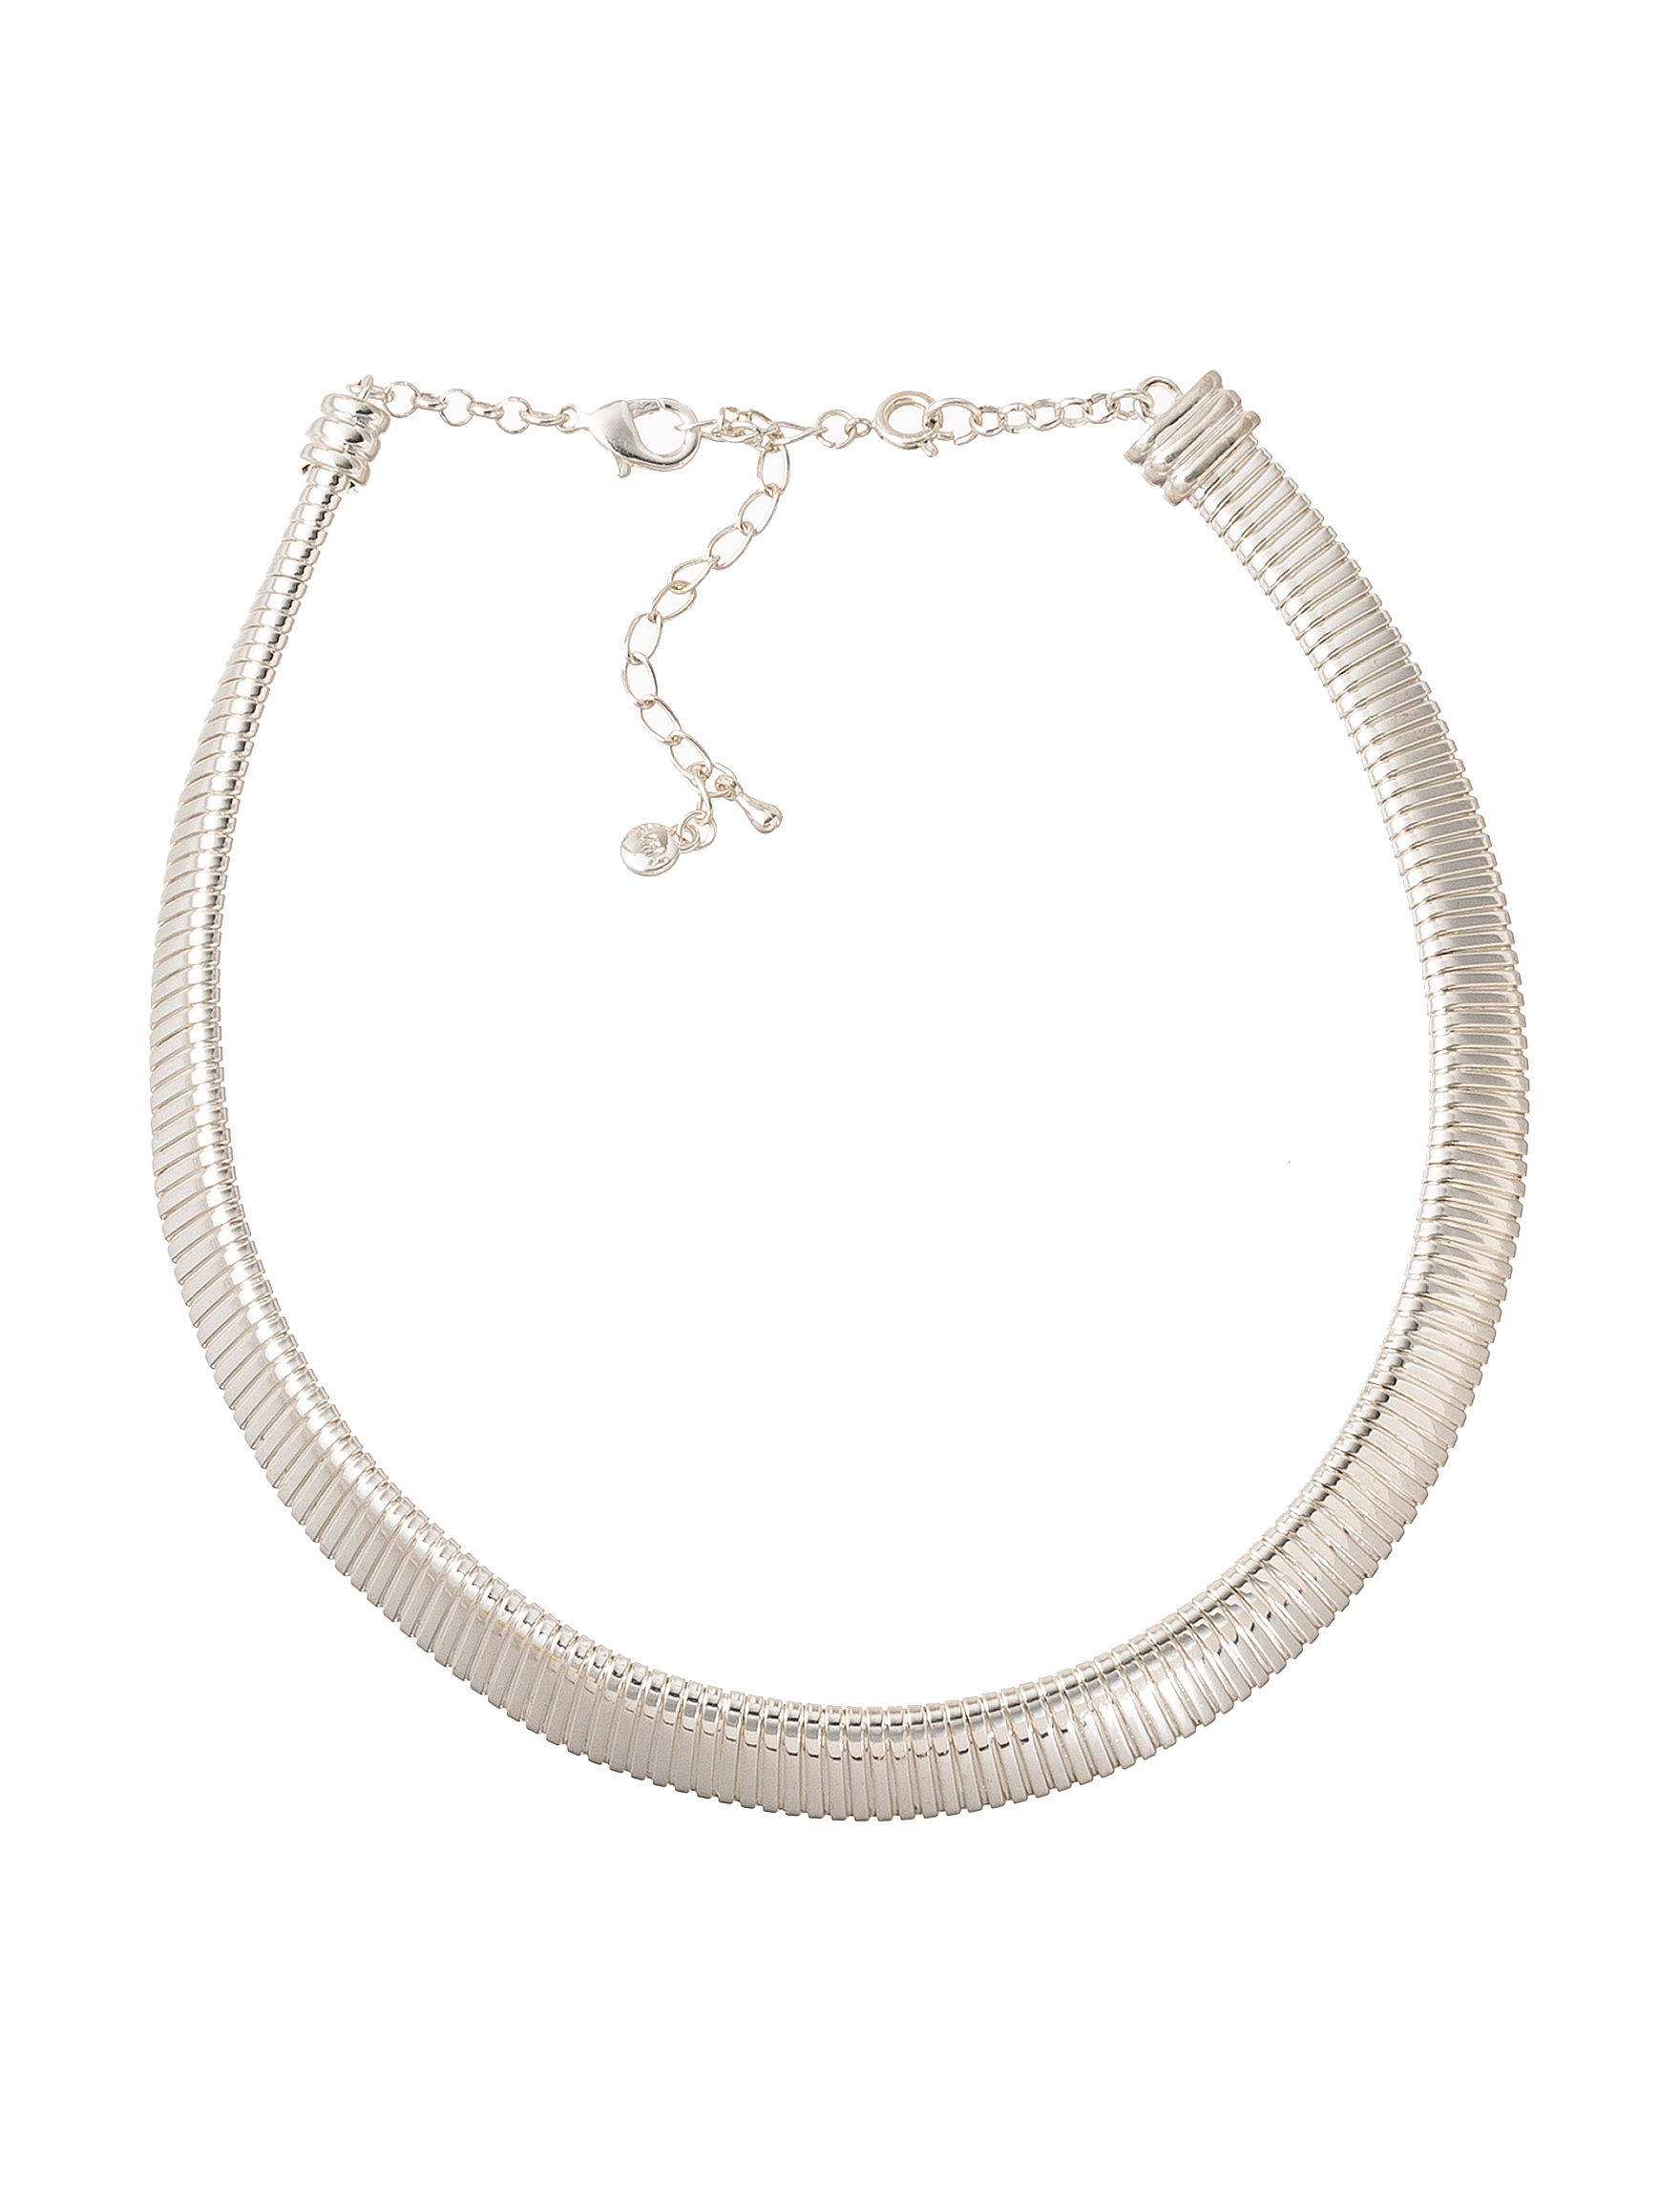 Roman White / Silver Necklaces & Pendants Fashion Jewelry